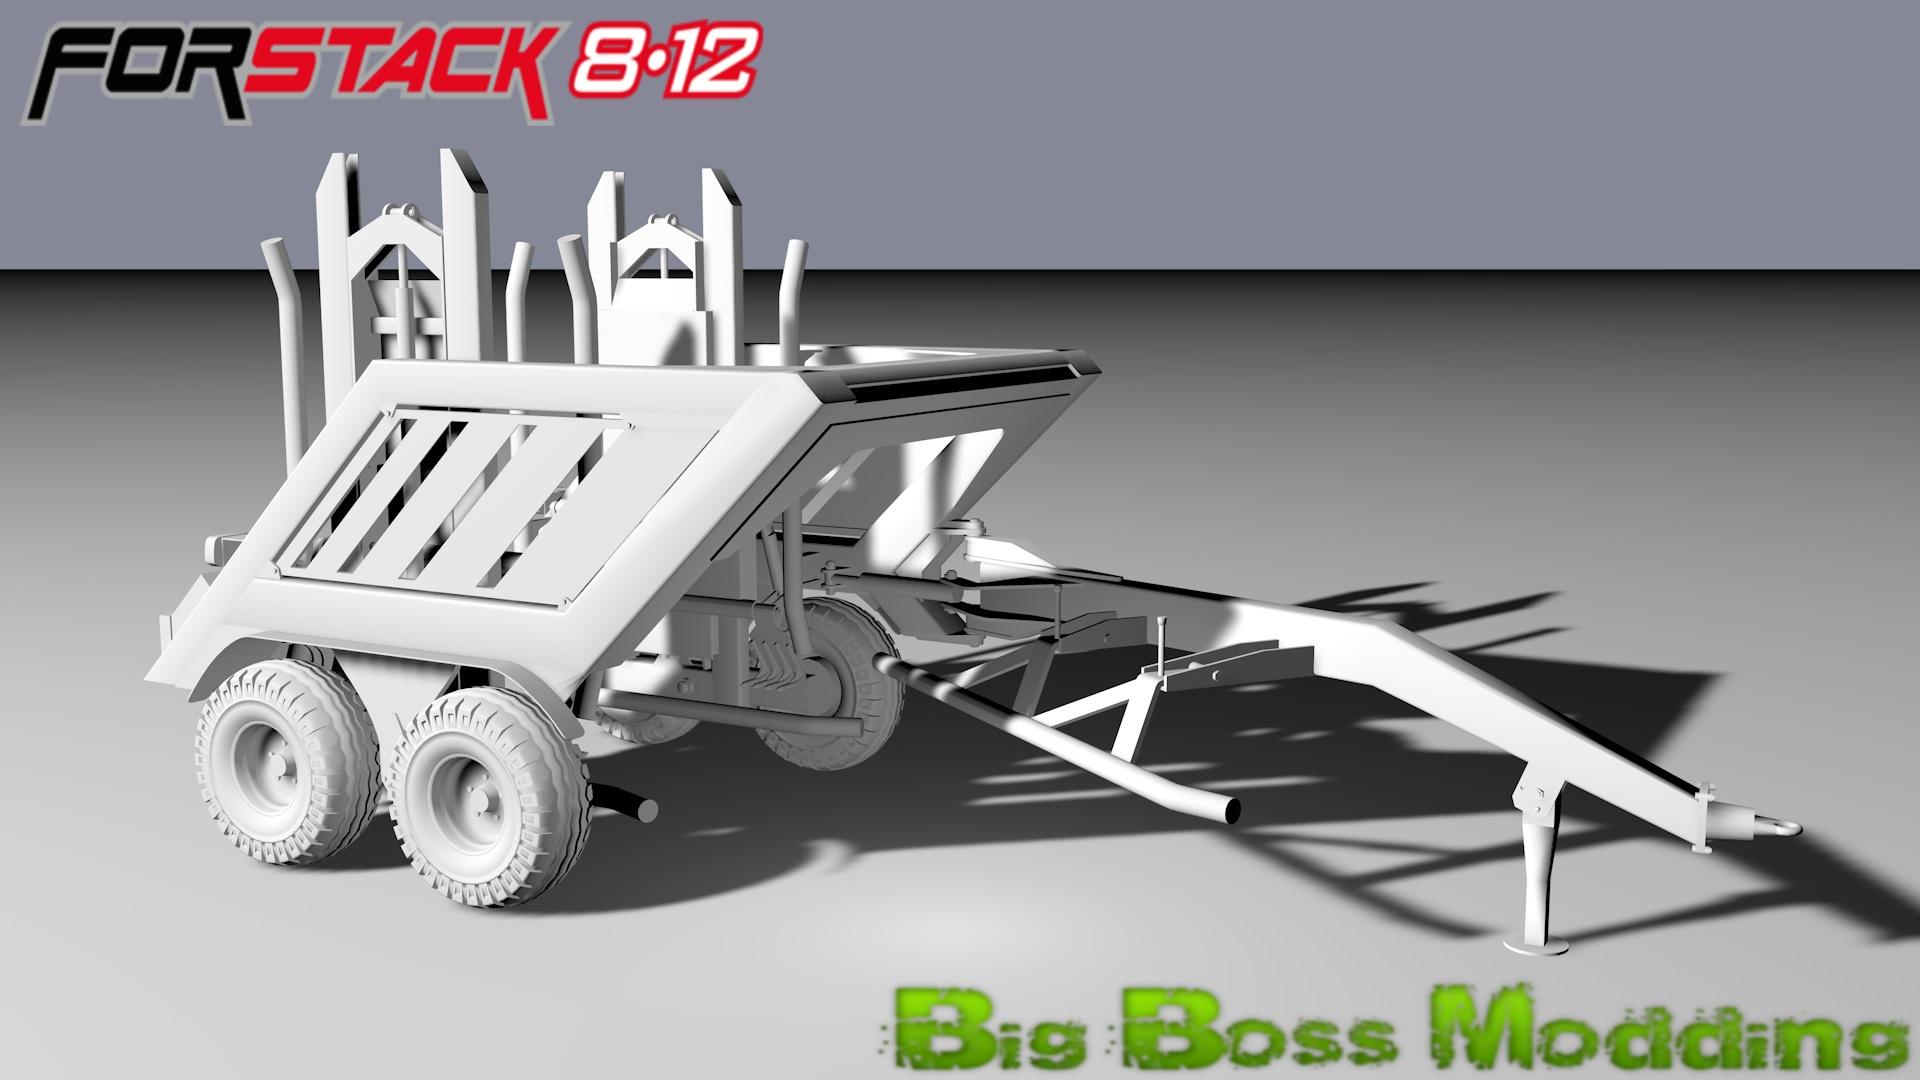 [T.E.P.] Arcusin ForStack 8-12 [Actualizado 30-5-2014] Solo1gik0f